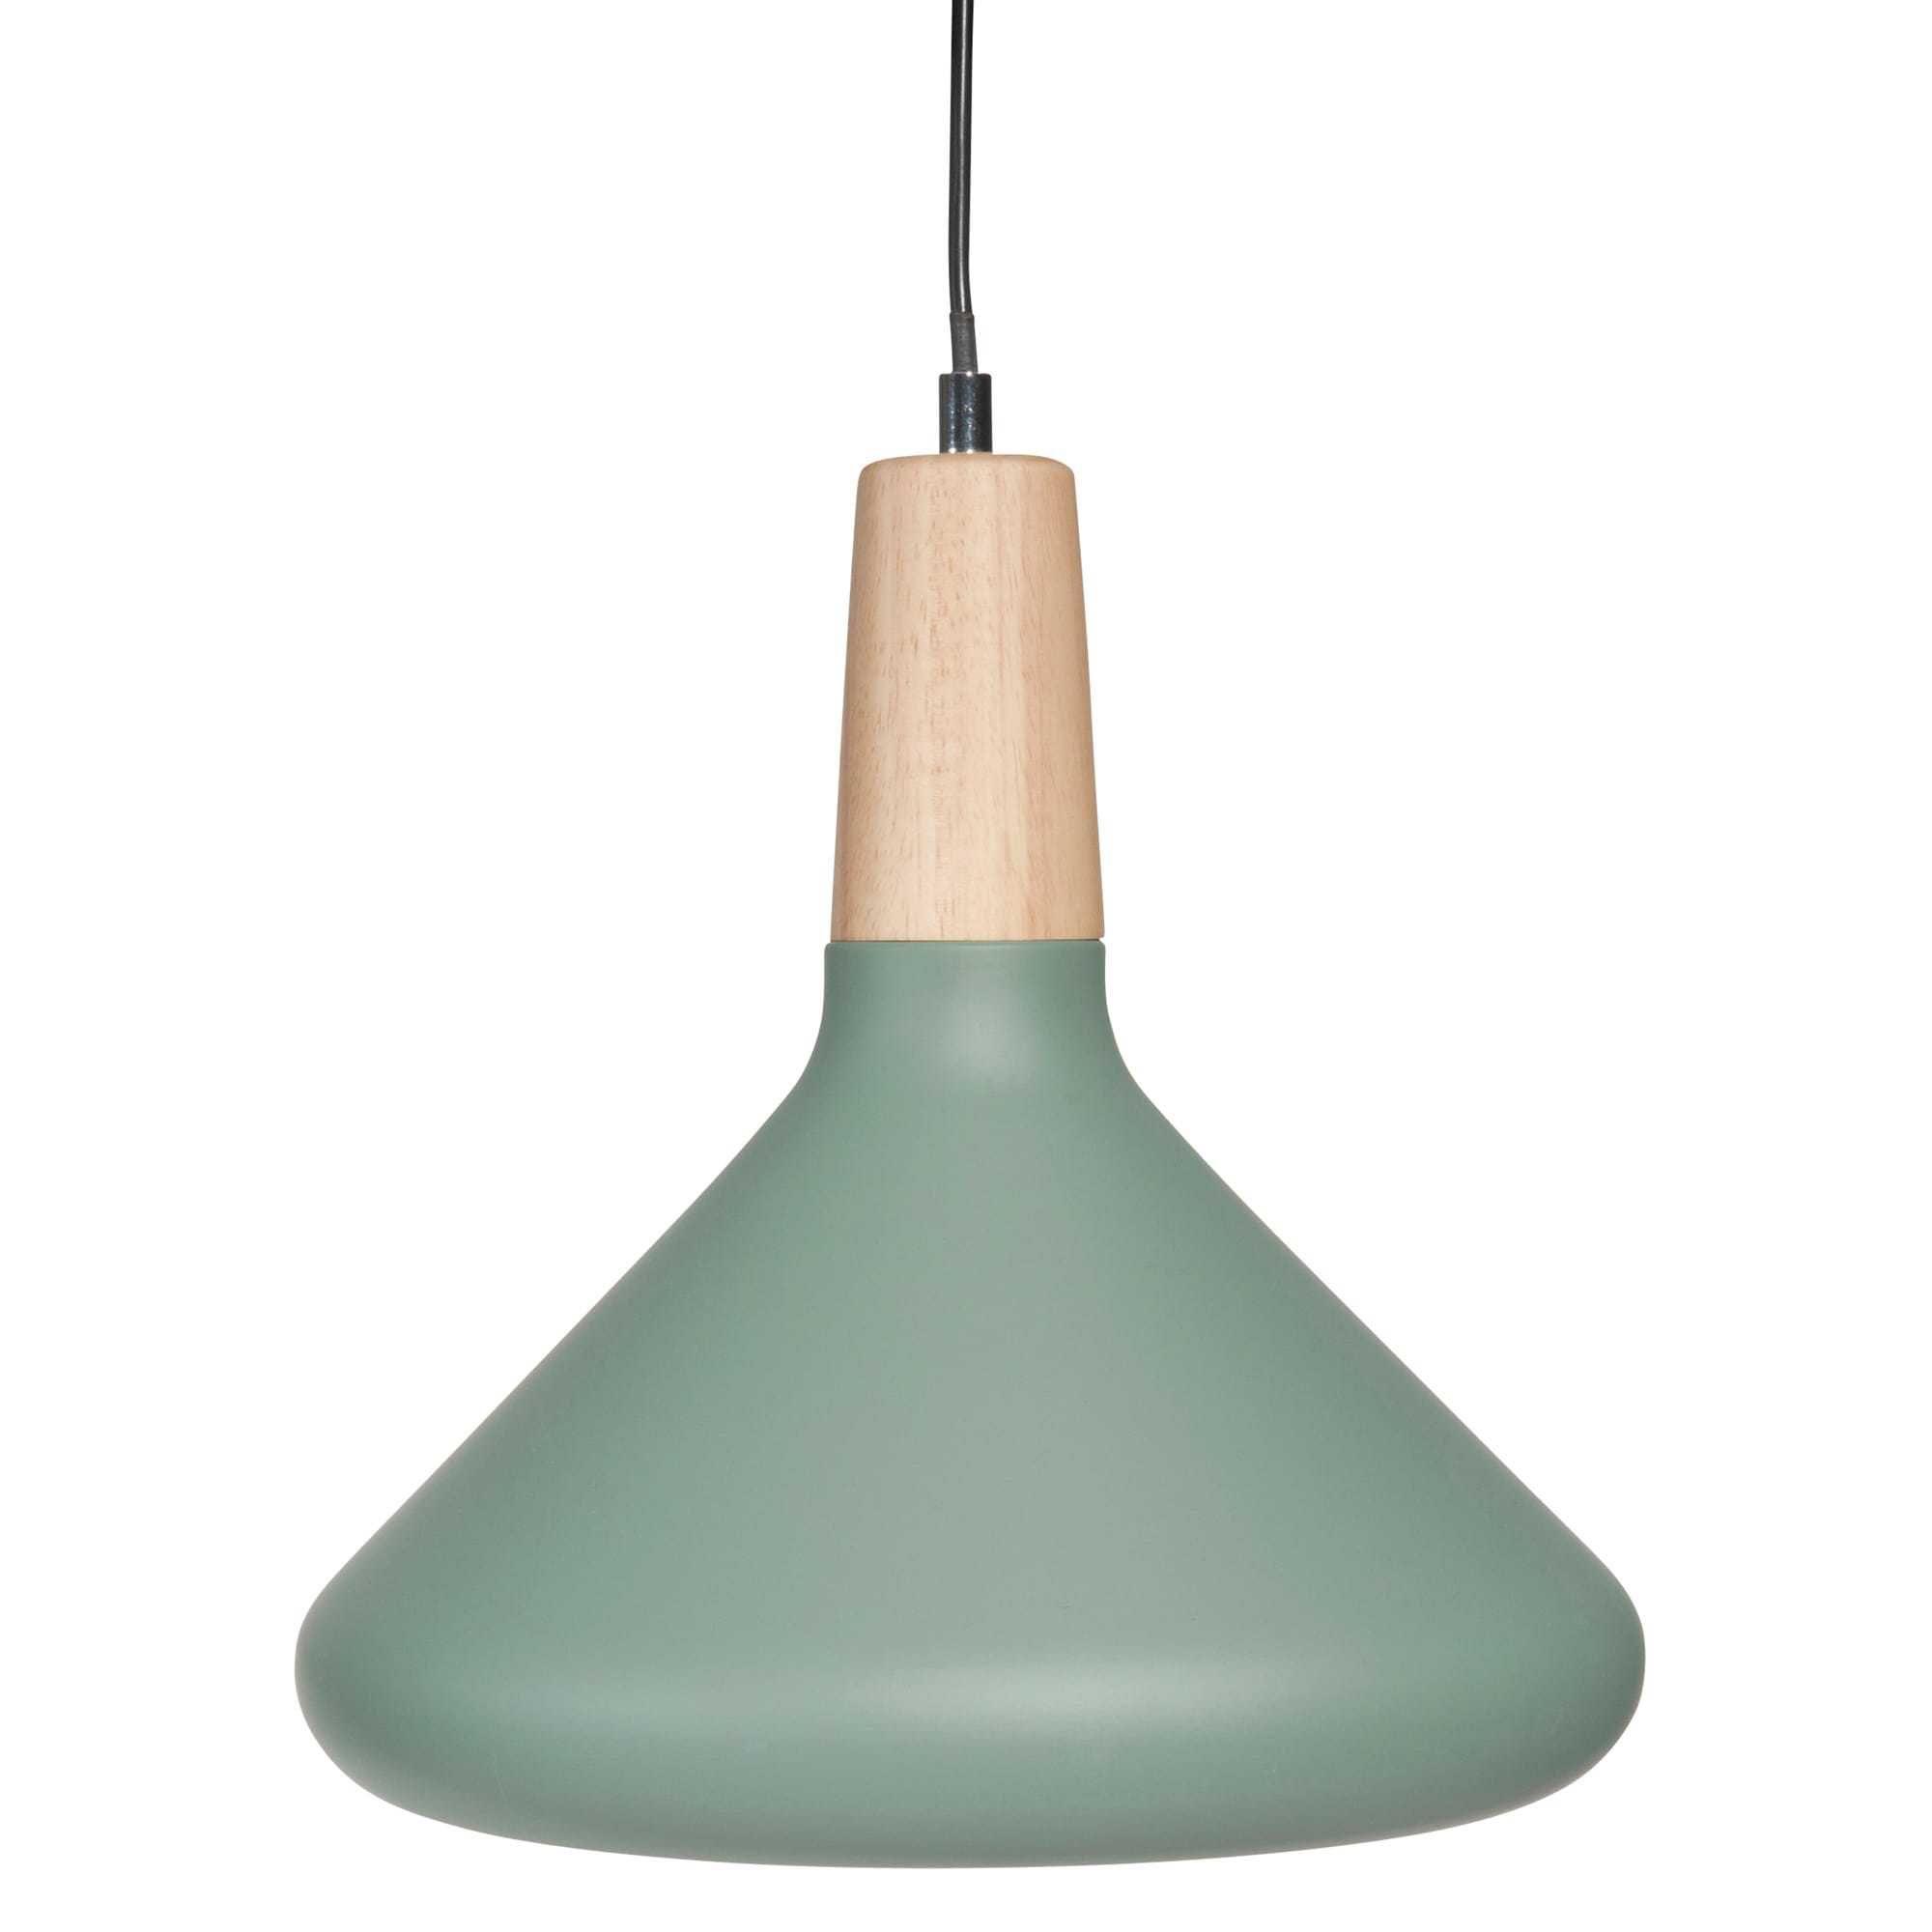 Lampada A Sospensione Verde In Metallo D 30 Cm HELGA